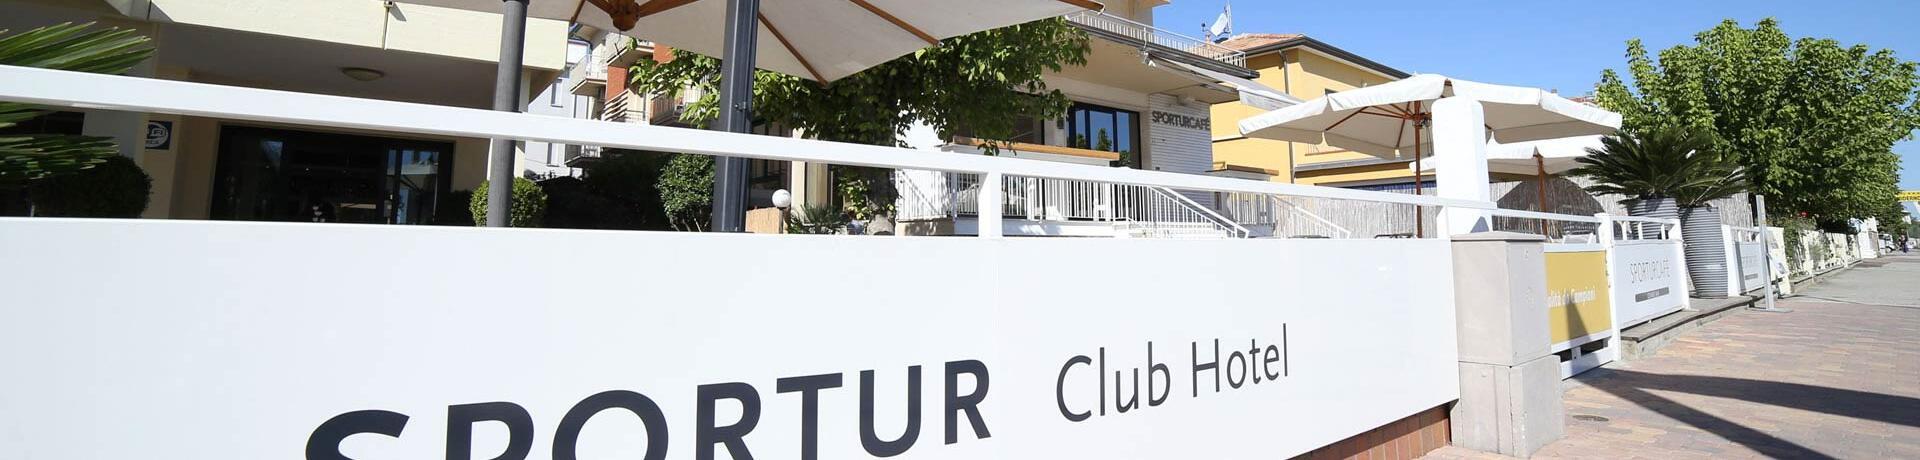 granfondoviadelsale de sportur-club-hotel 011